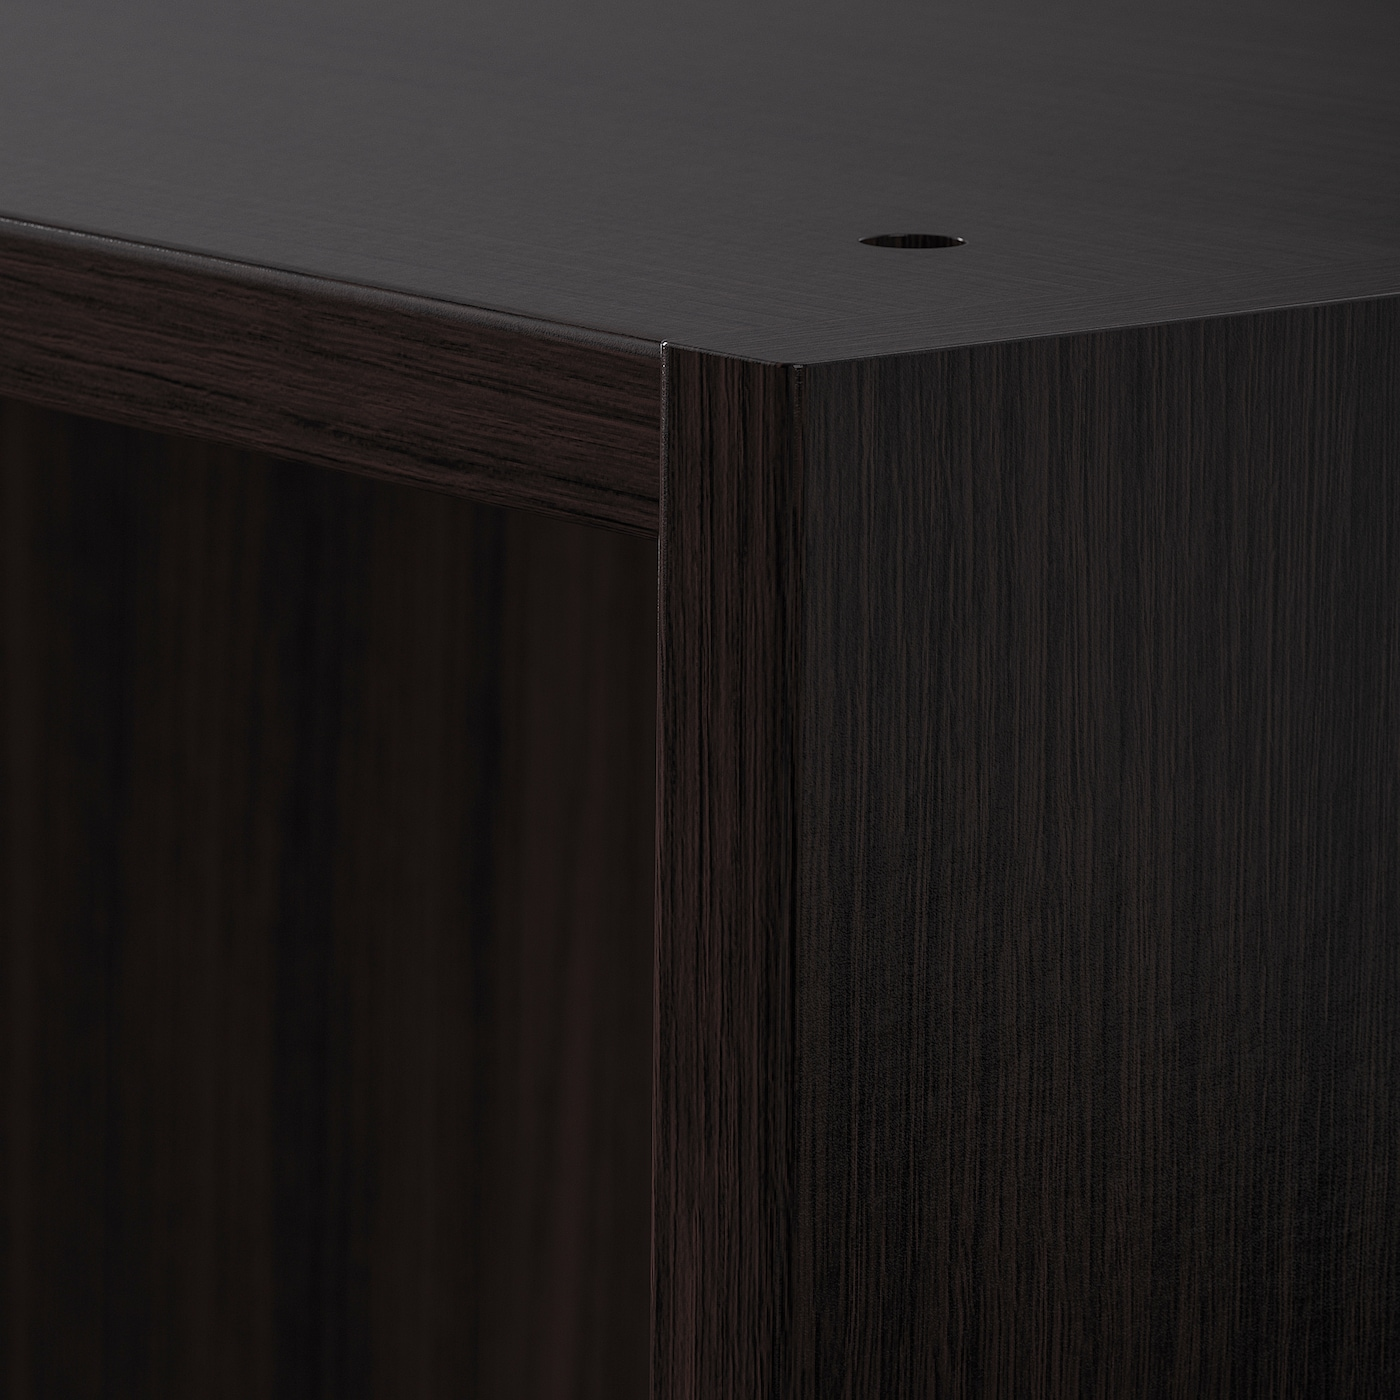 PAX هيكل خزانة الملابس, أسود-بني, 50x58x236 سم